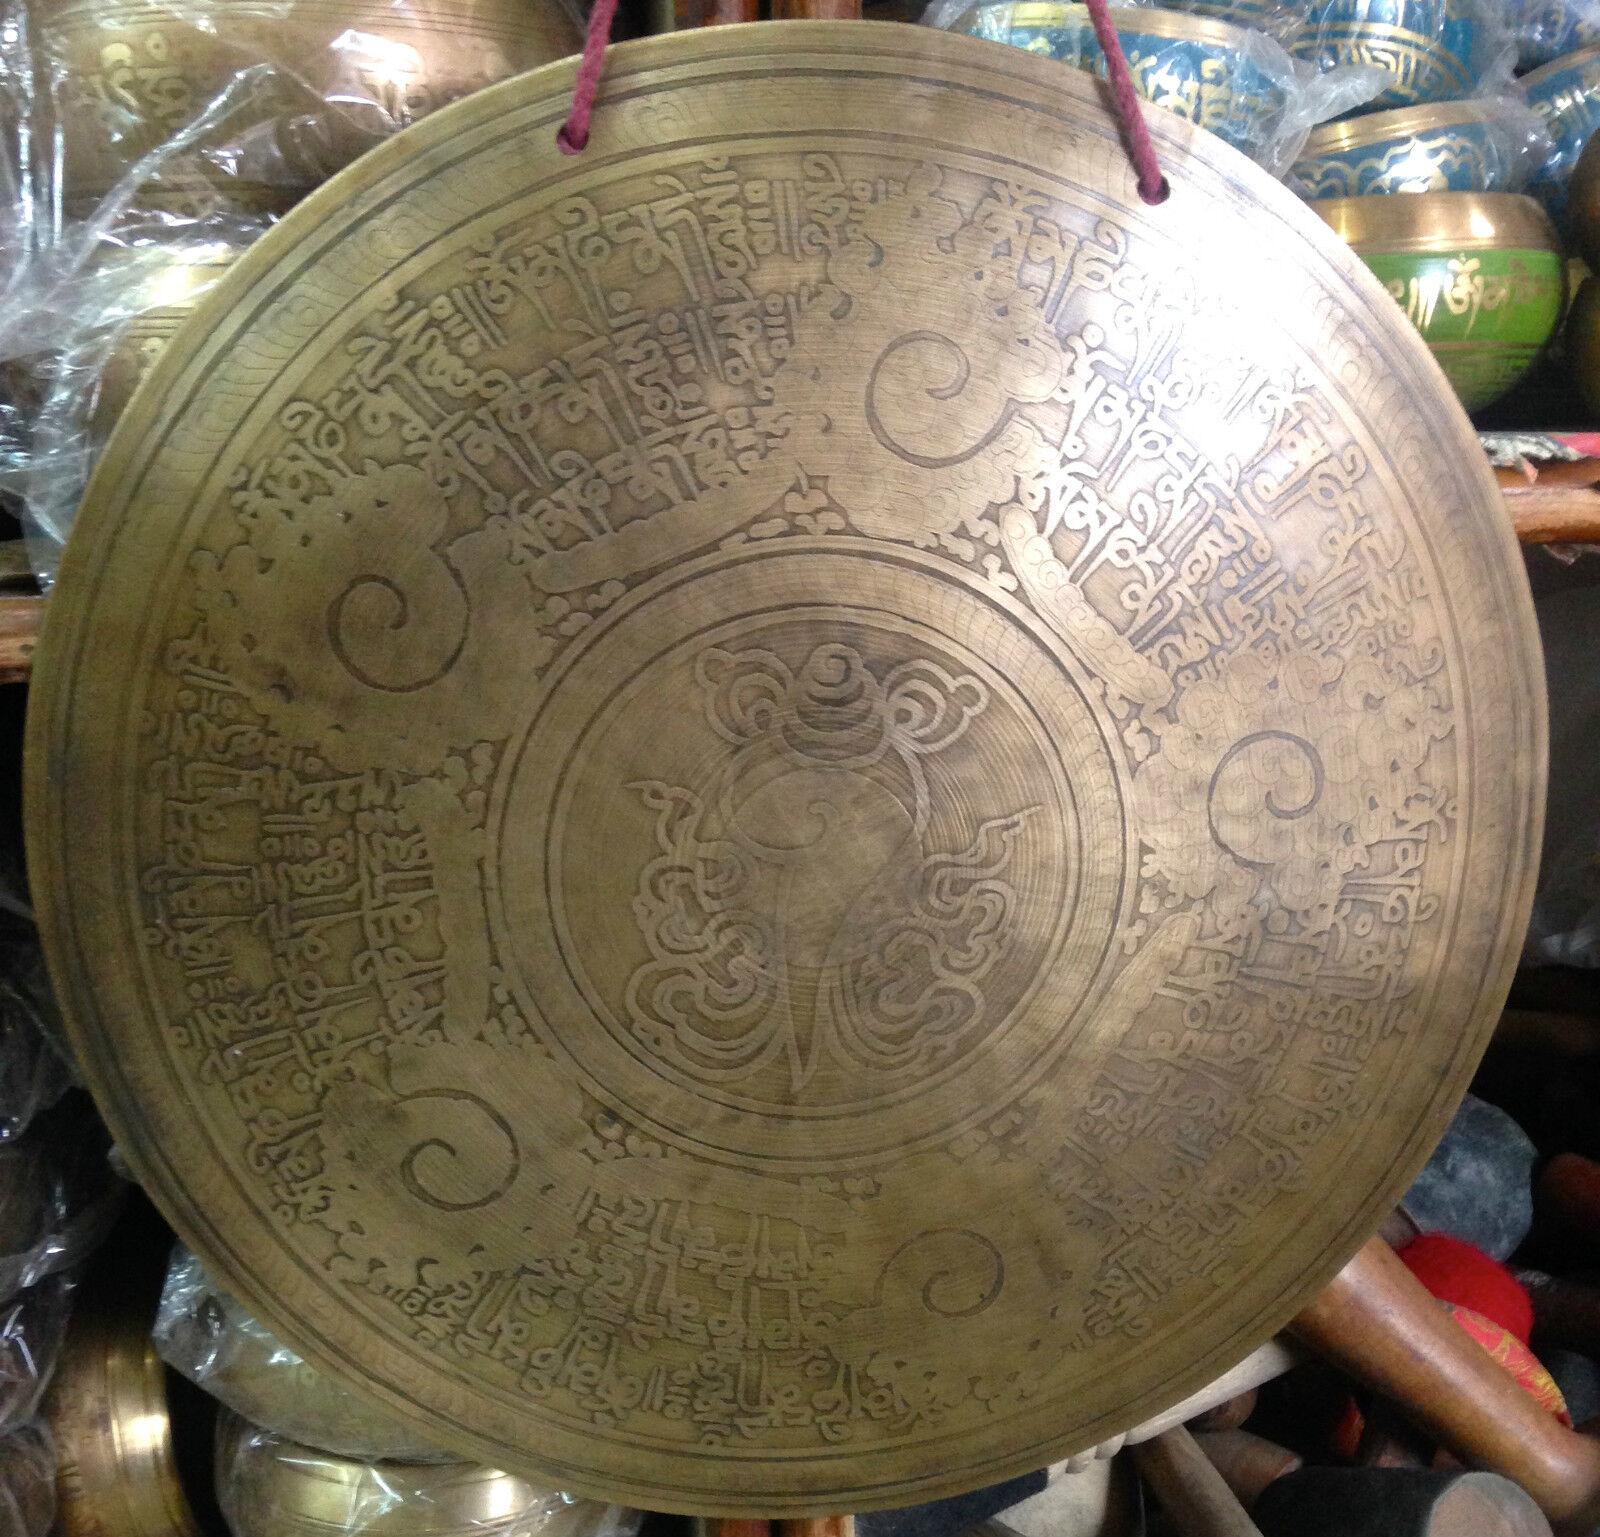 Gong Tibetano 35cm 1,5Kg Meditacion chakra Terapia musical Grabado a mano Nepal